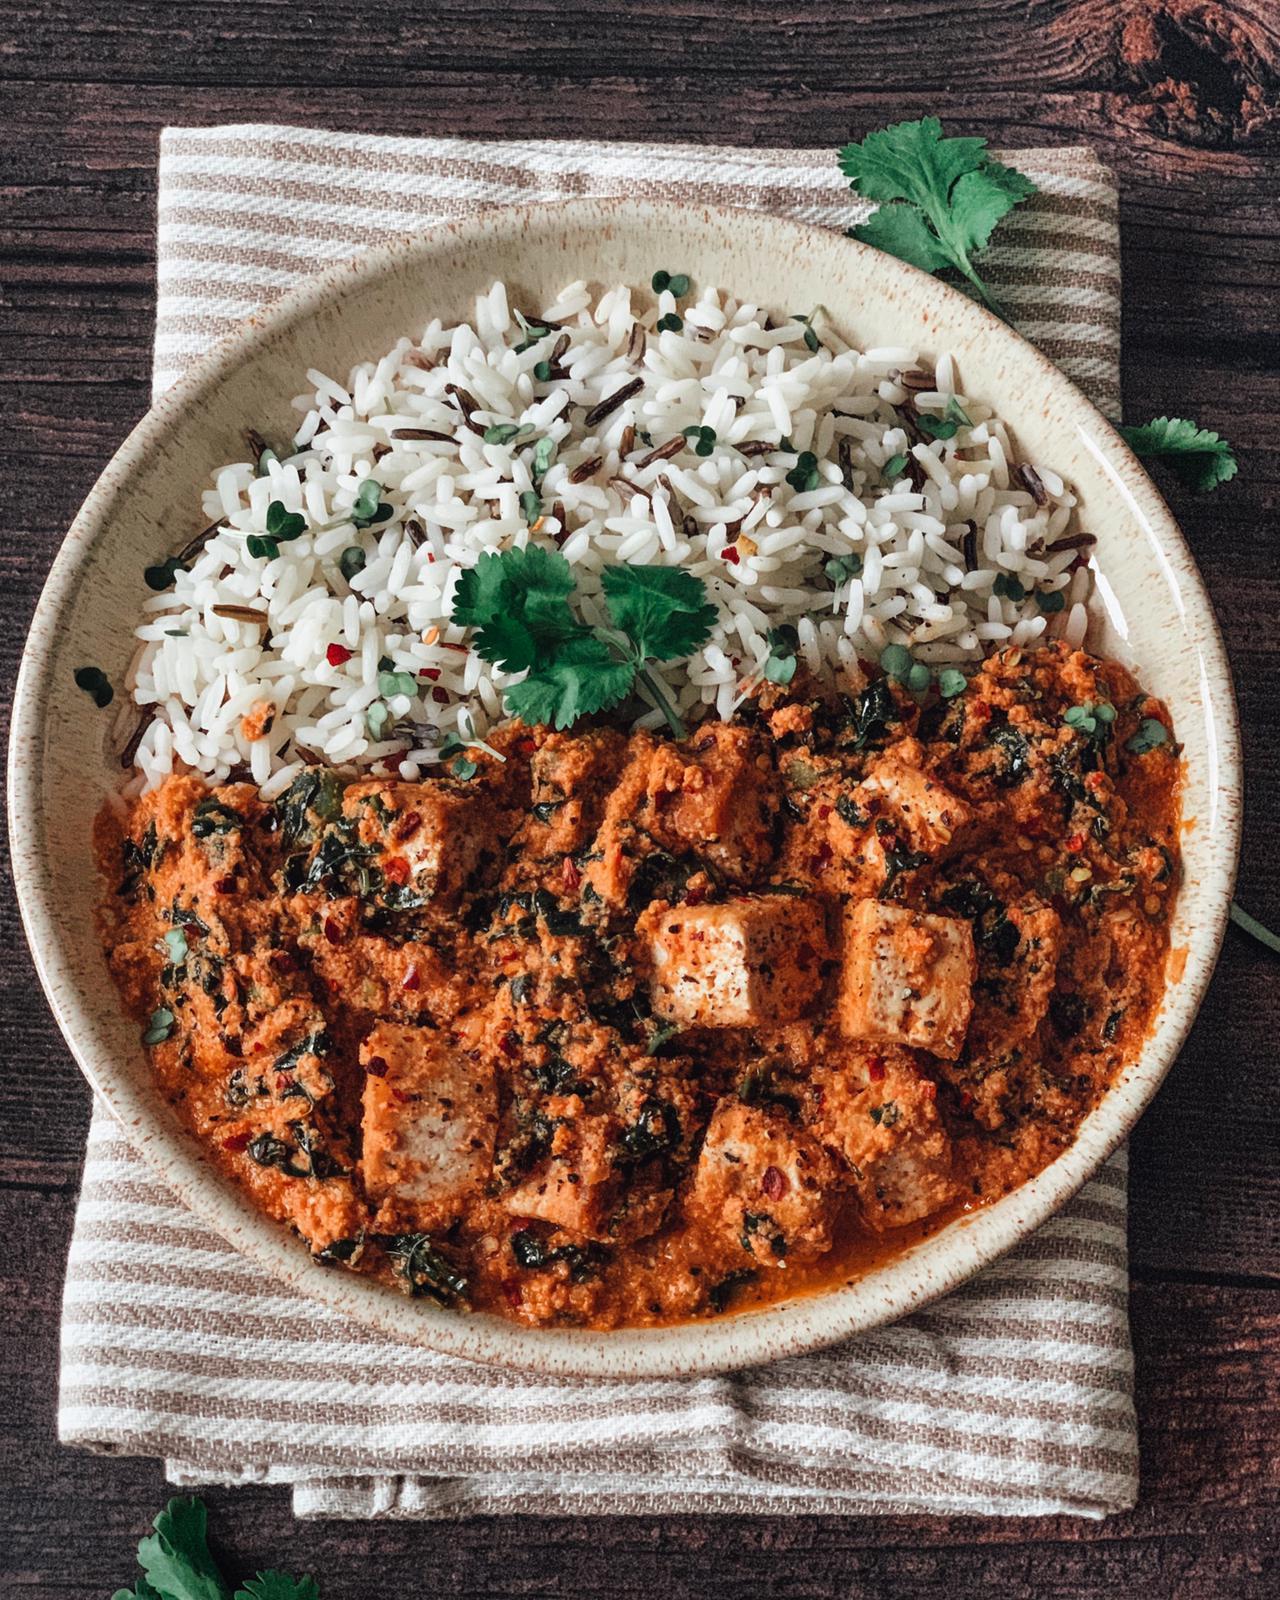 Nigerian-inspired Vegan Egusi (Melon) Seed Stew with Tofu